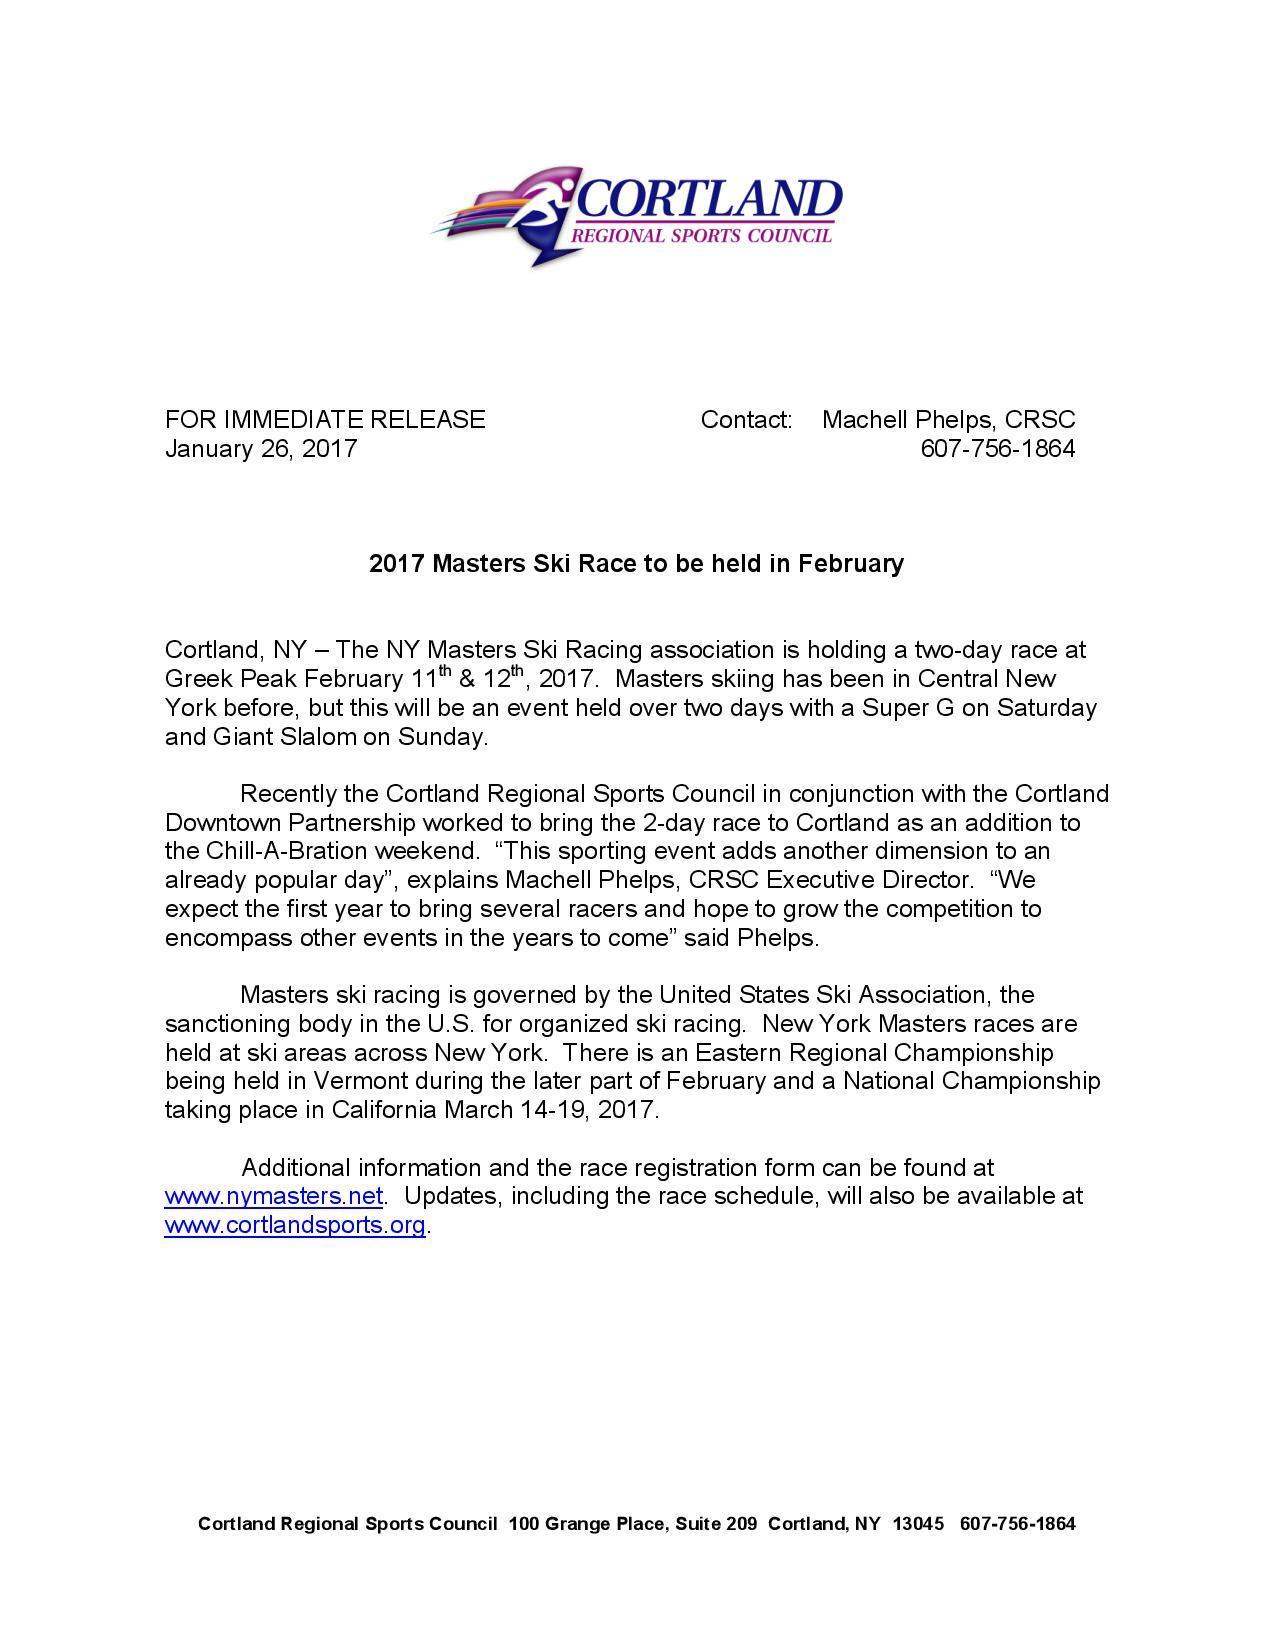 NY Masters - Ski Racing Press Release - Cortland Regional